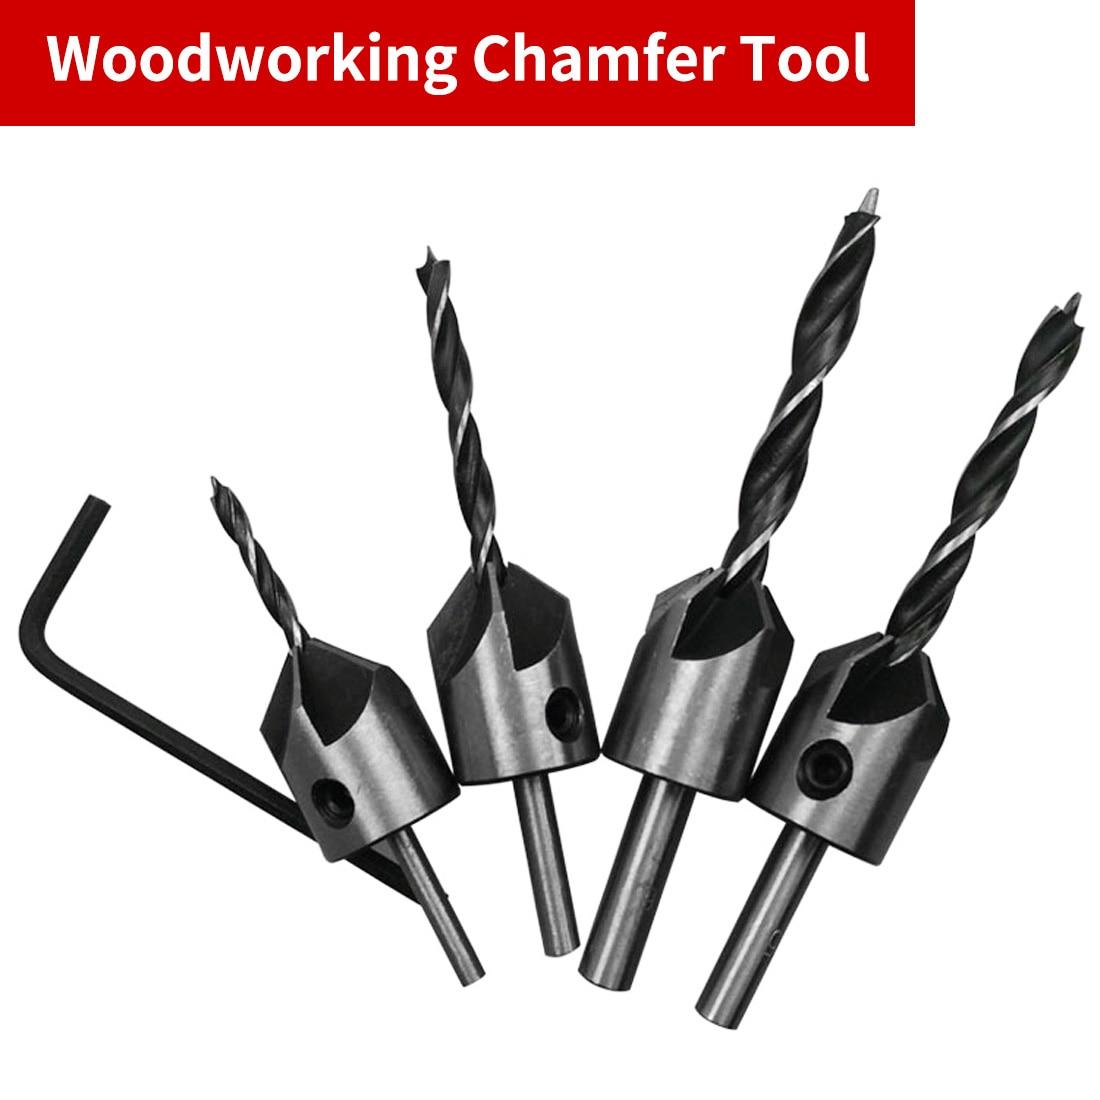 4Pcs HSS 5 Flutes Countersink Drill Bit Set Woodworking Carpentry Tool 6-12mm